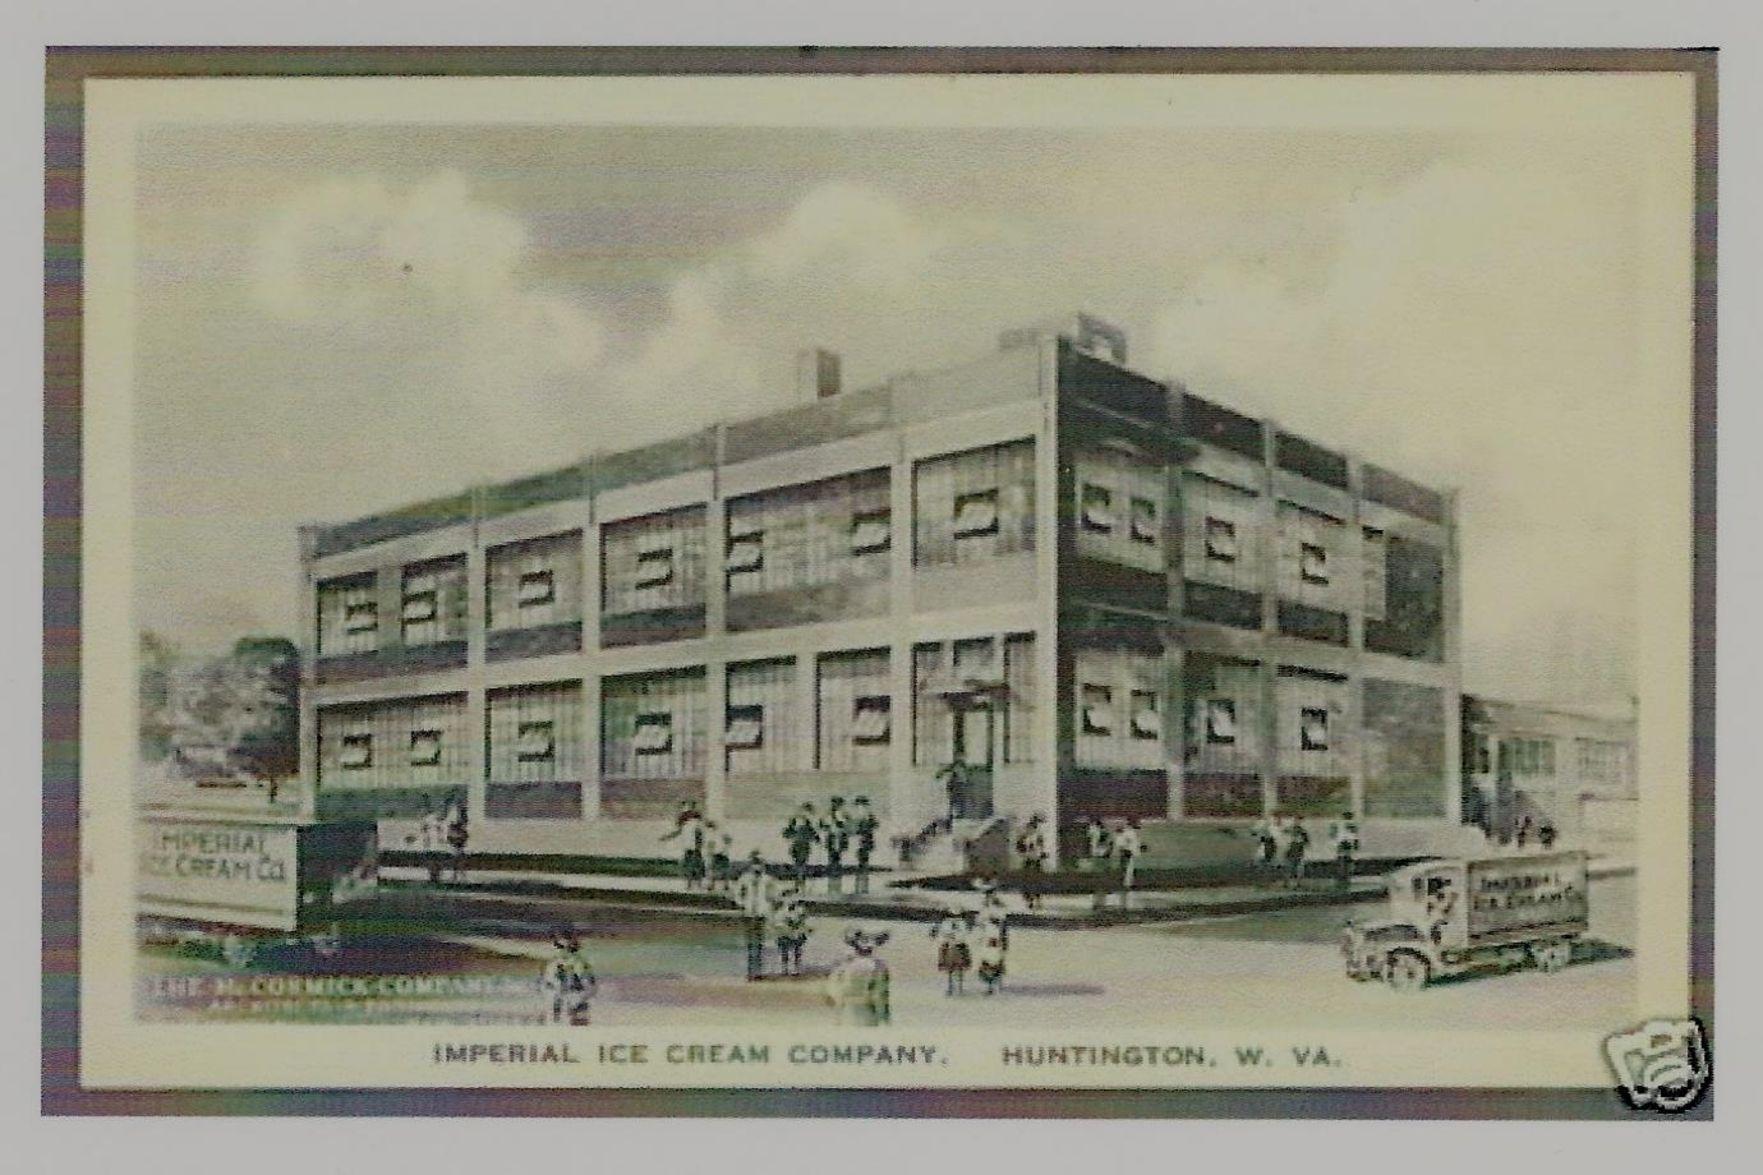 Lost Huntington: Imperial Ice Cream Co.